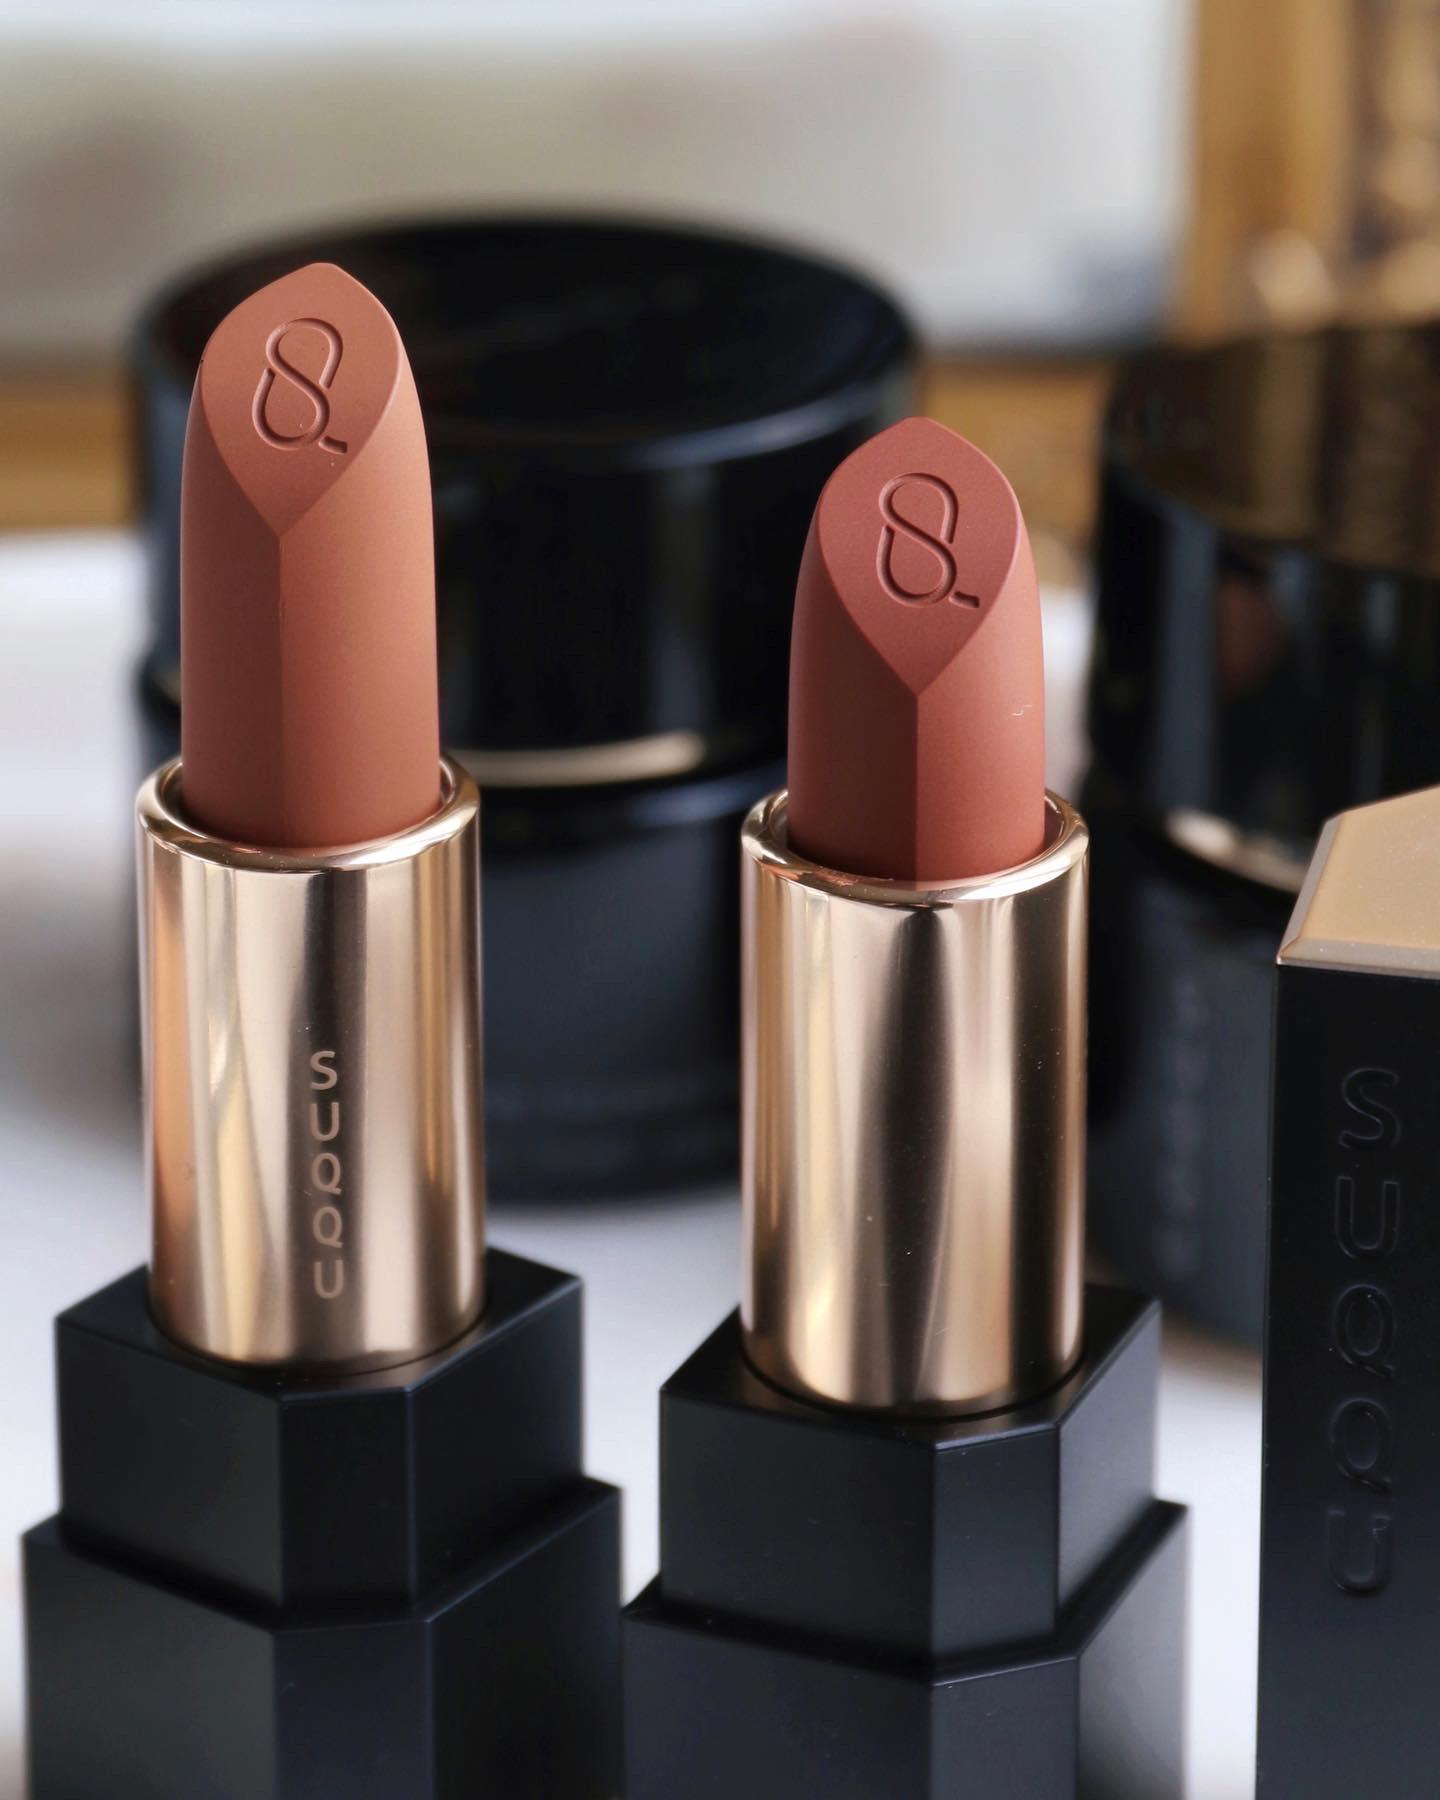 SUQQU Sheer Matte Lipstick